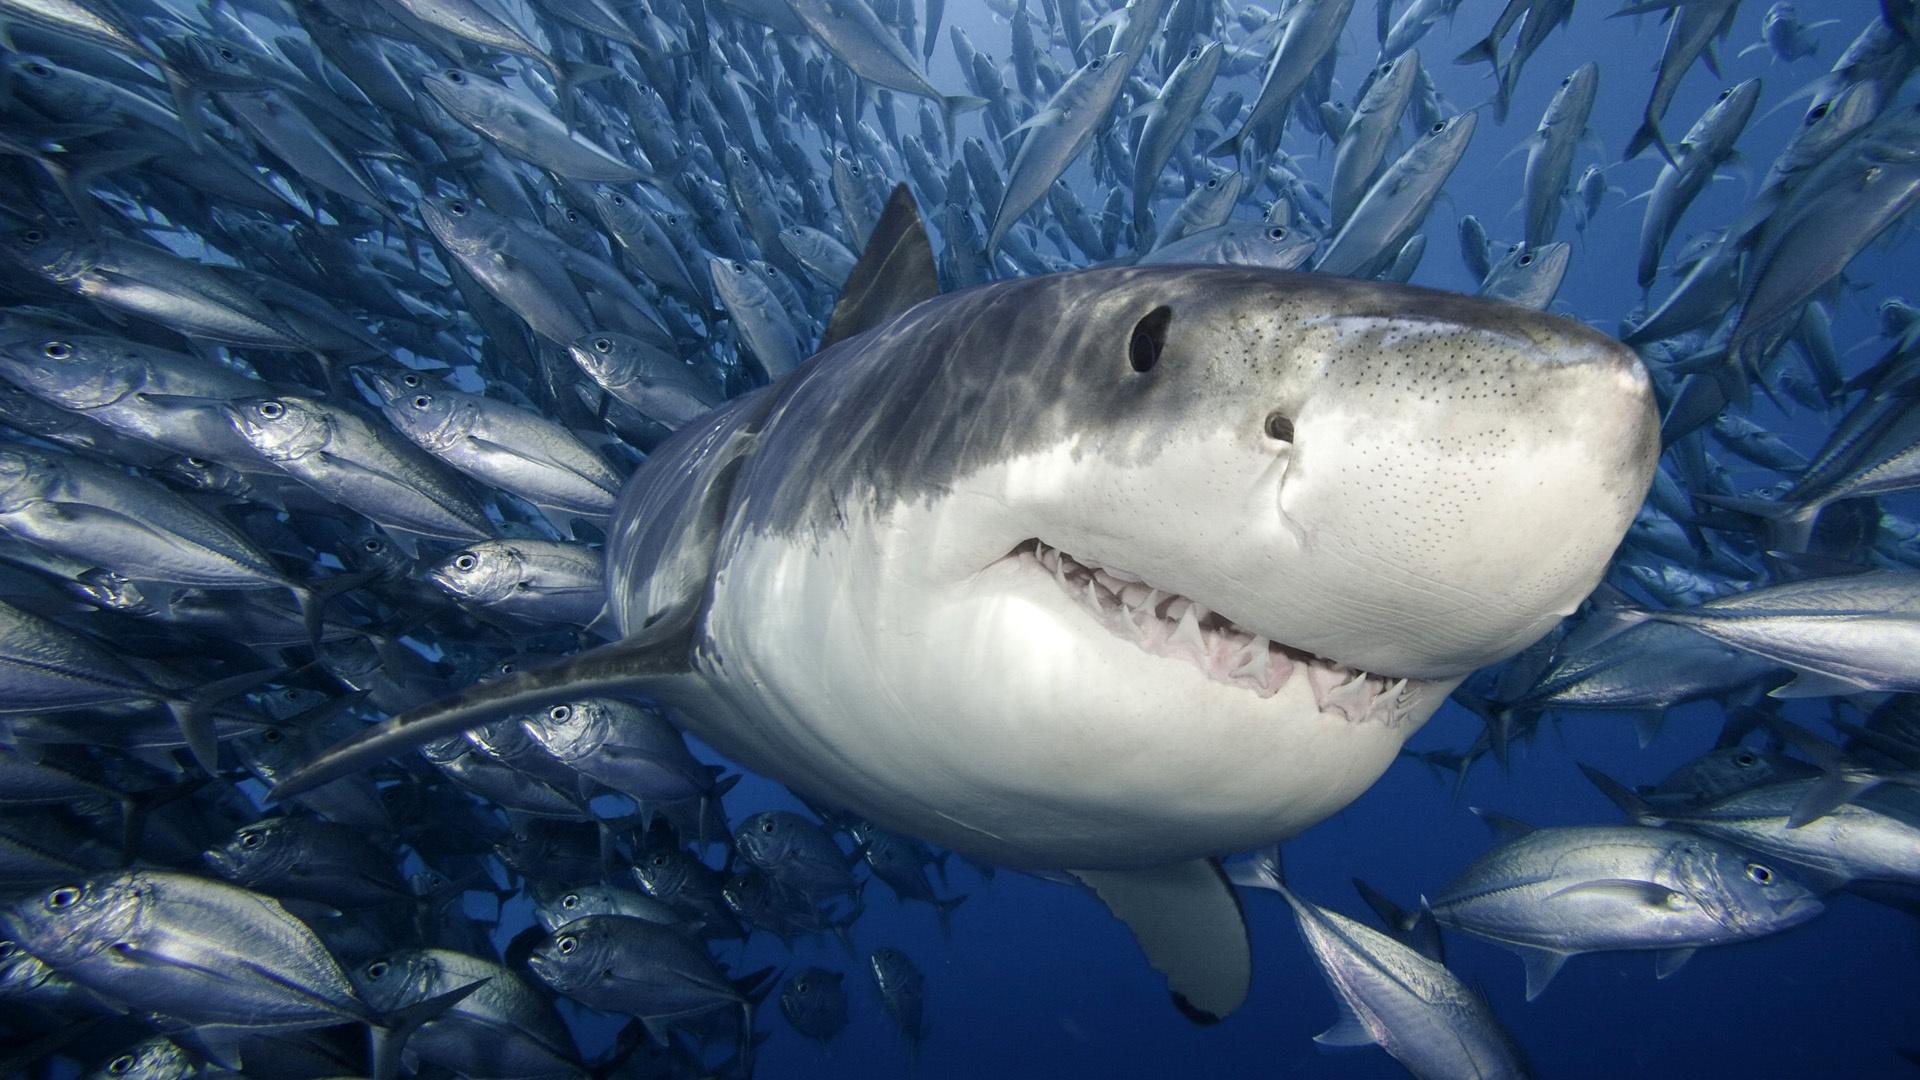 HD Megalodon Shark Week 2013 Wallpaper Wallpaper Download HD Megalodon 1920x1080